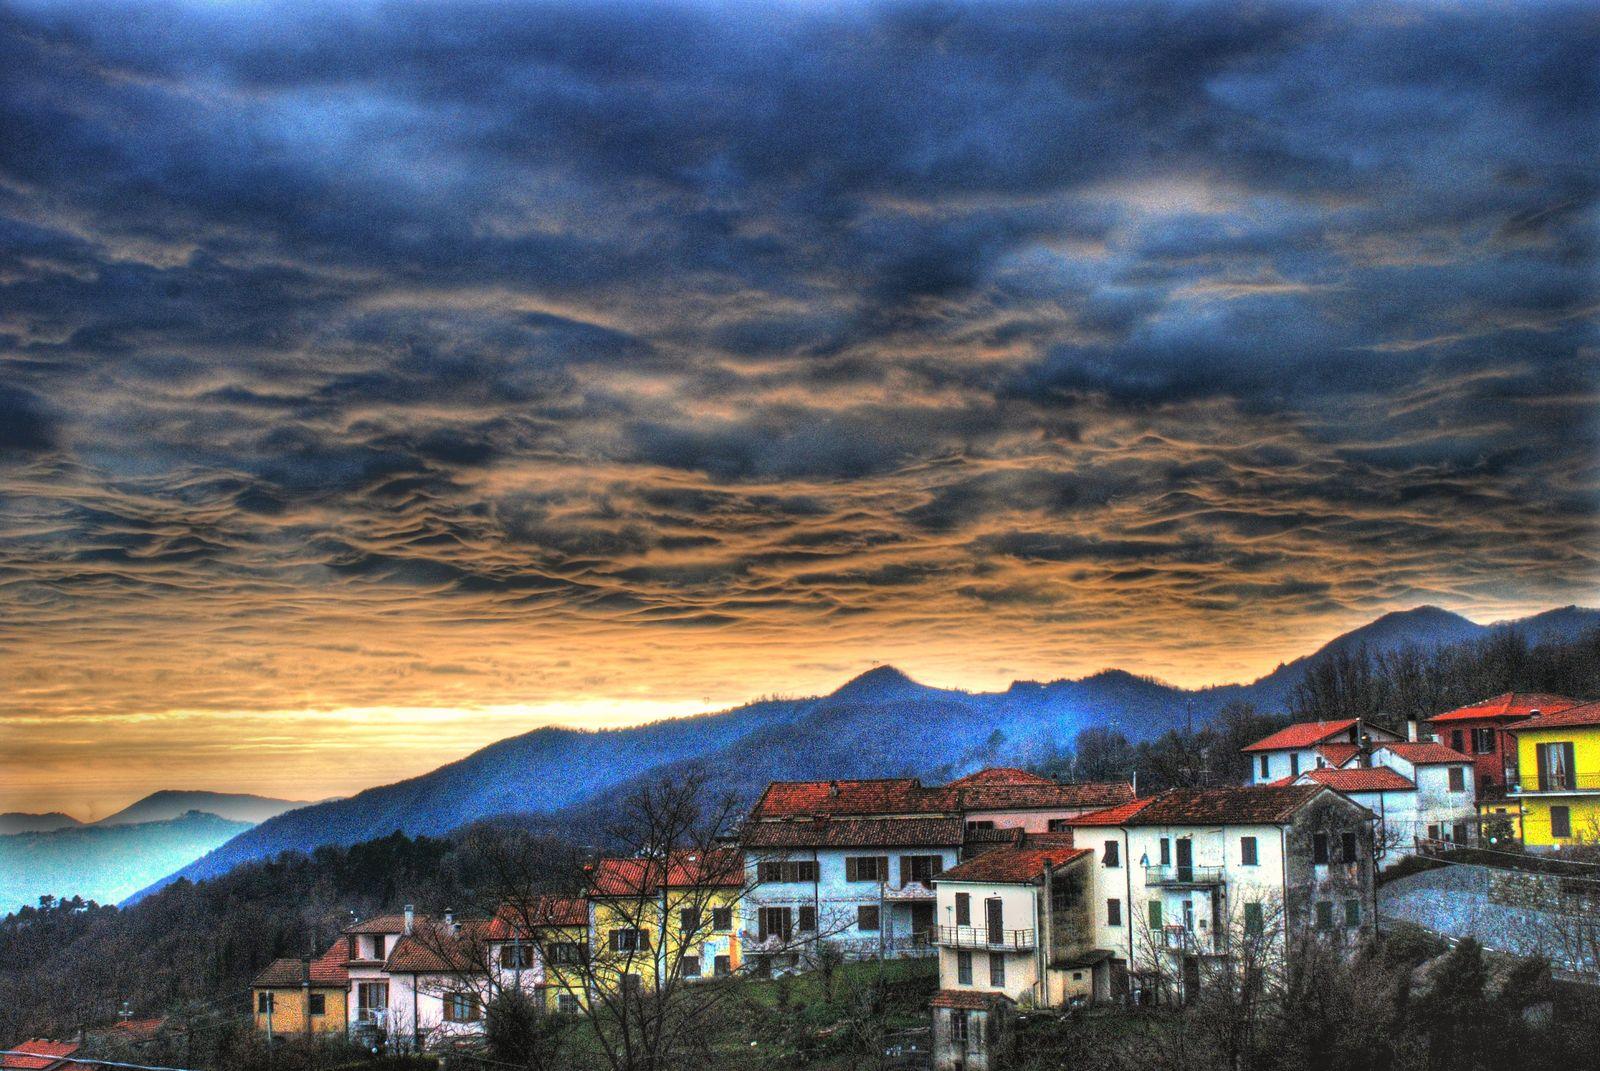 Podenzana - A village between two valleys